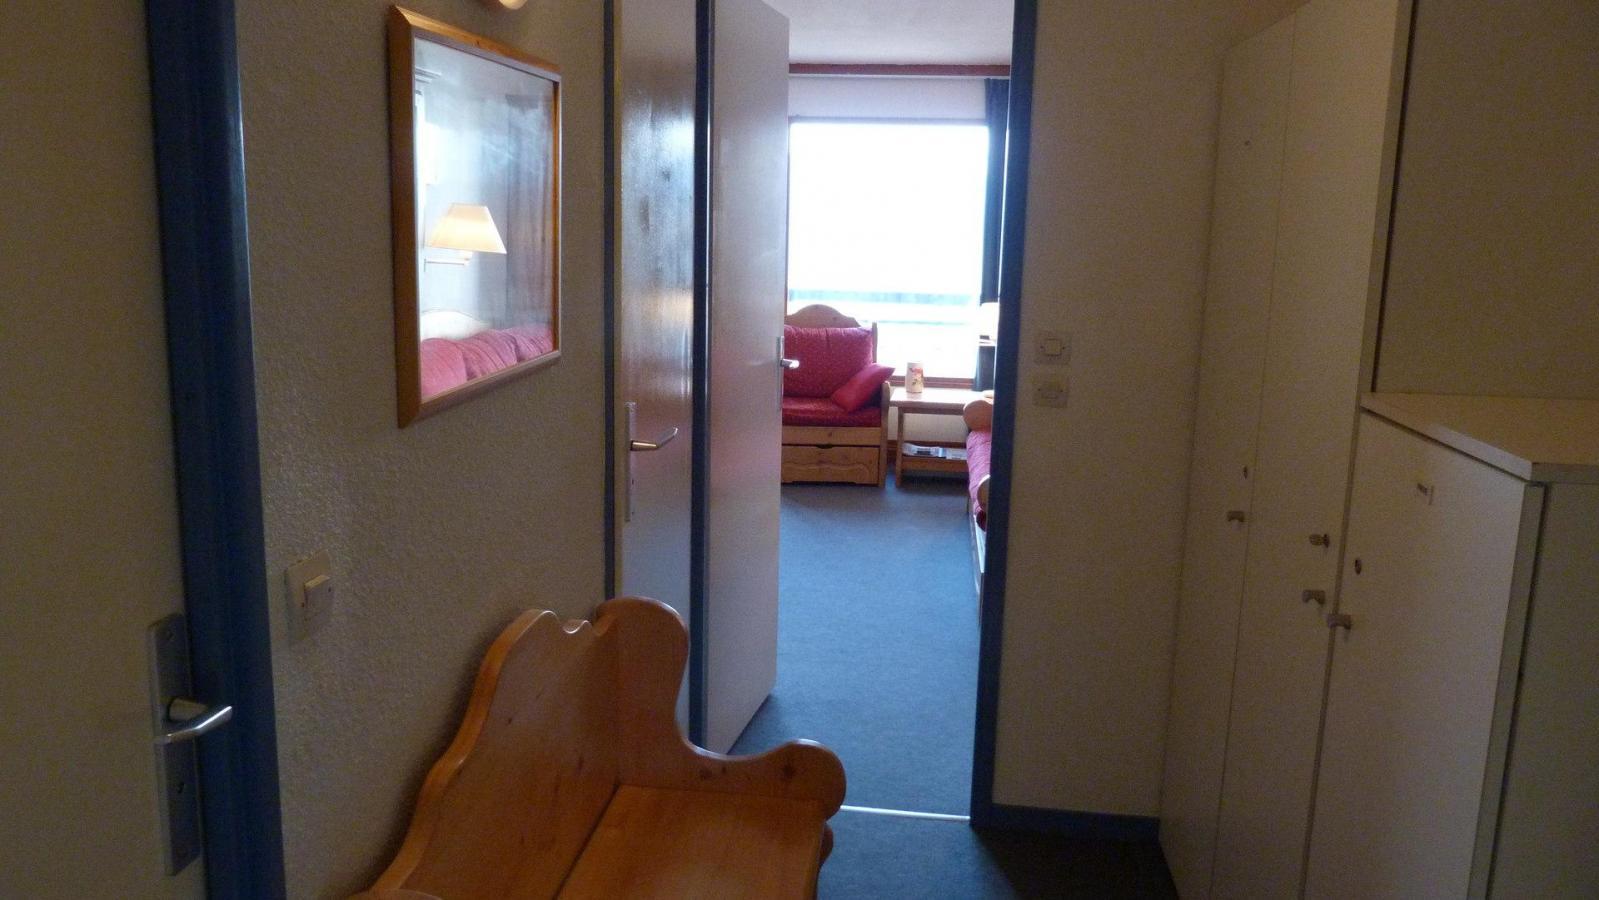 Location au ski Appartement 2 pièces 4 personnes (609) - Residence Le Ruitor - Les Arcs - Table